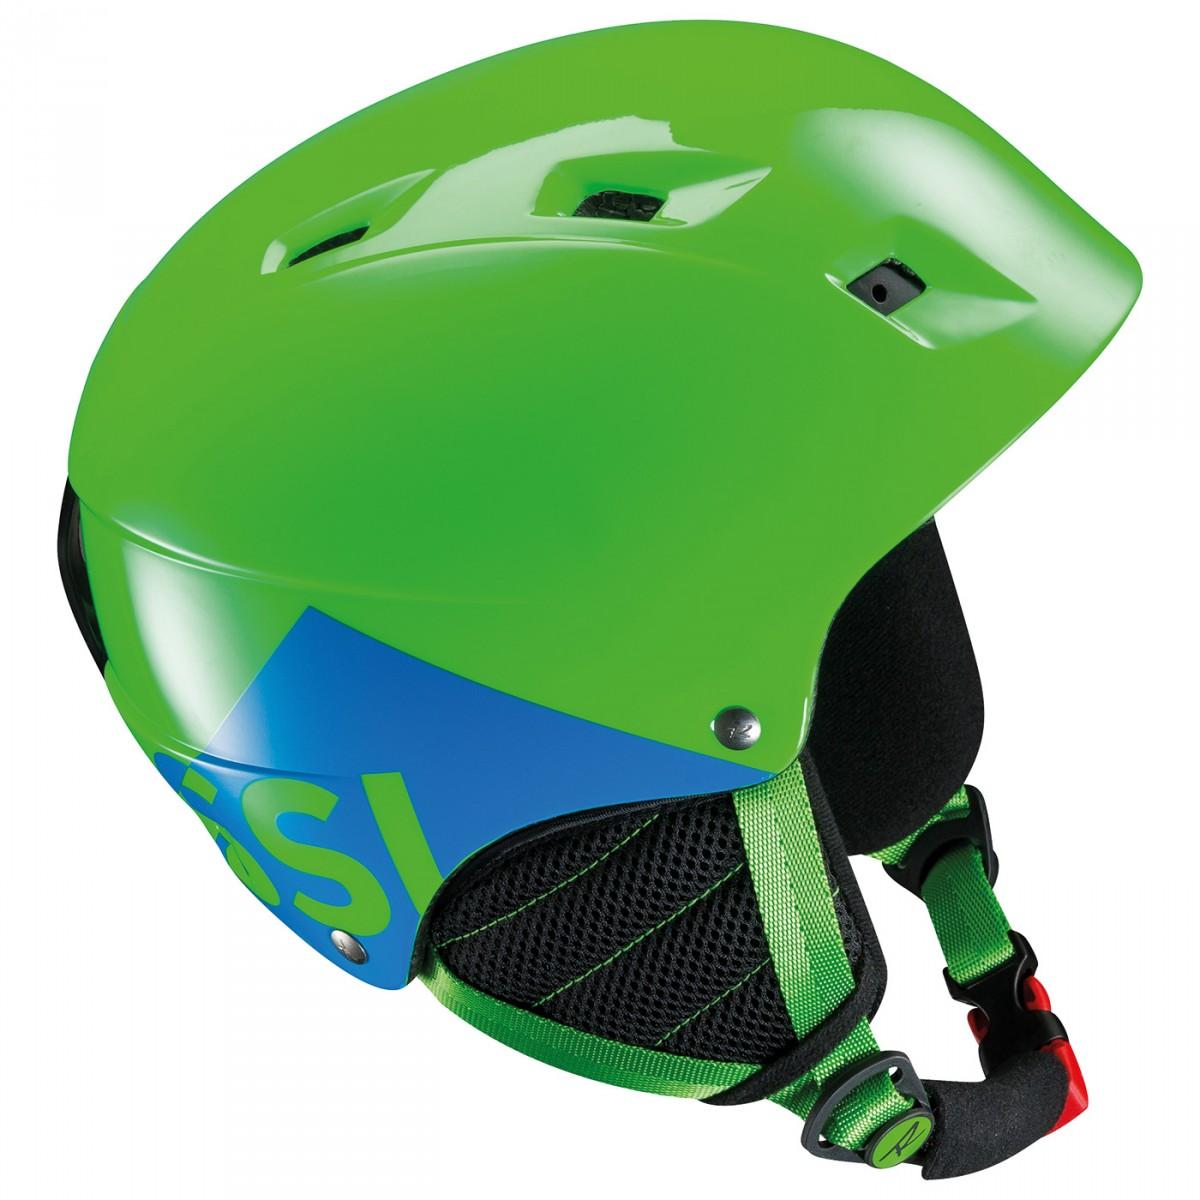 Casco sci Rossignol Comp J (Colore: verde, Taglia: 51/54)